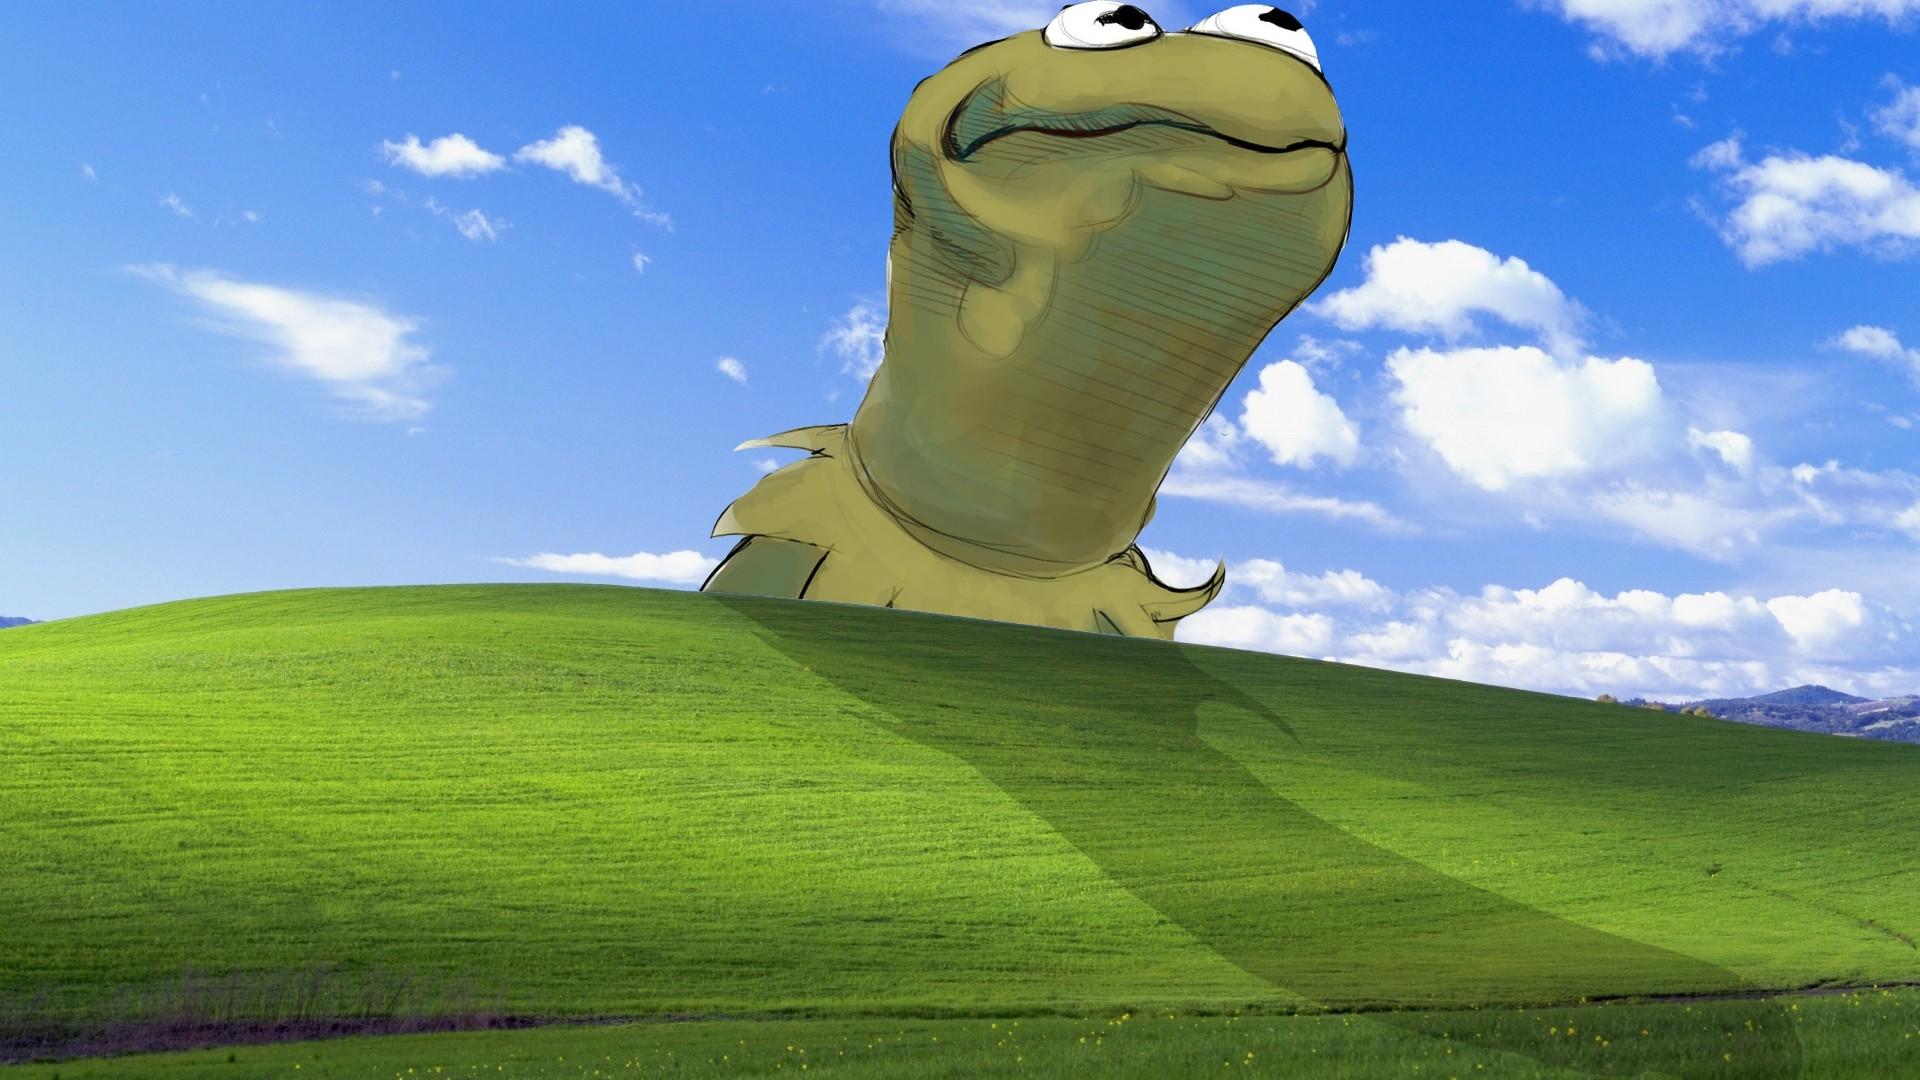 Download 1920x1080 Bliss windows xp kermit the frog